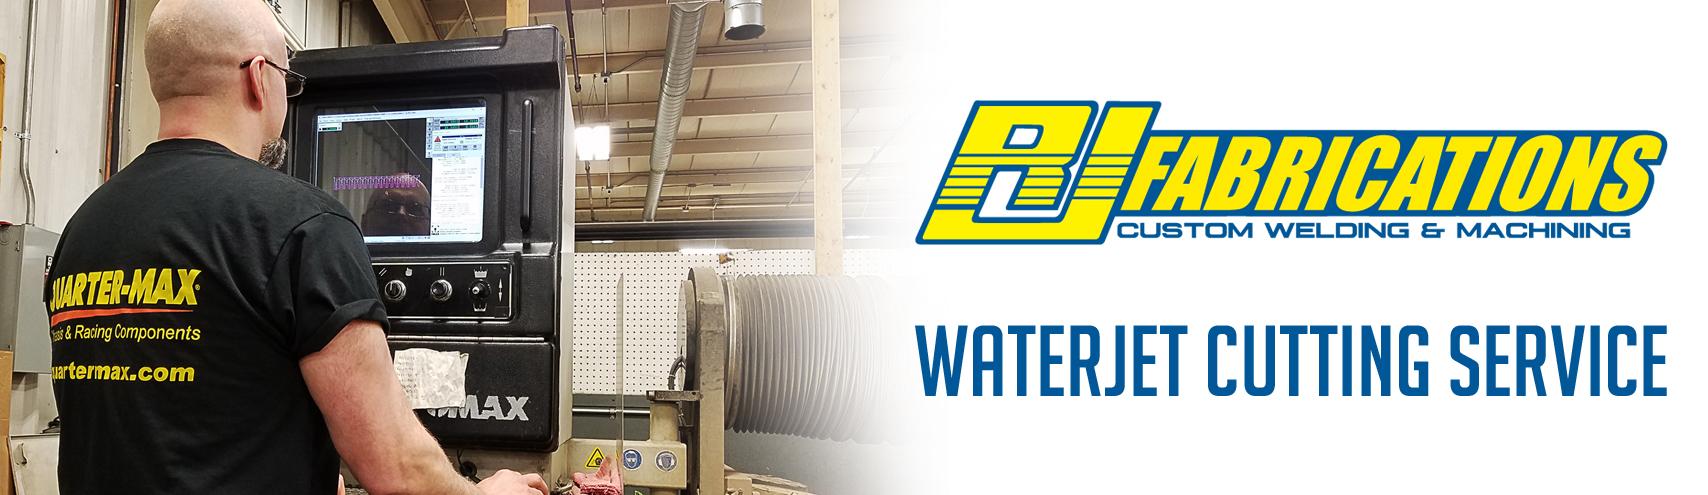 water-jet-cutter-service.jpg